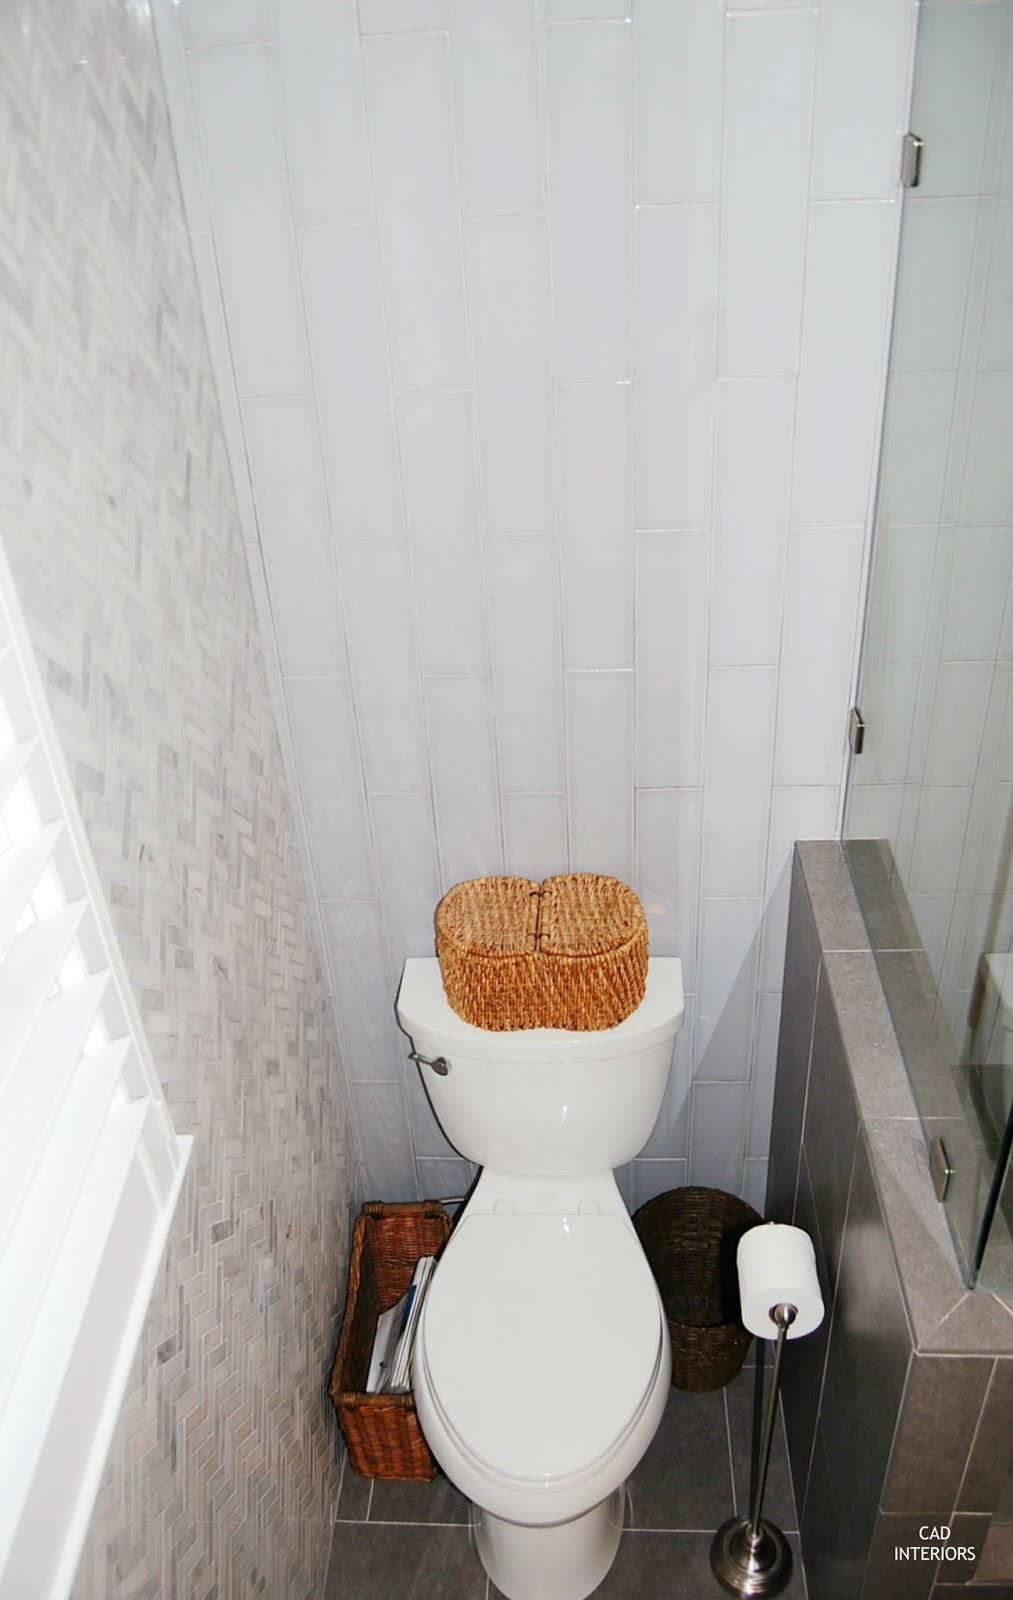 classic modern bathroom design renovation interior design transitional